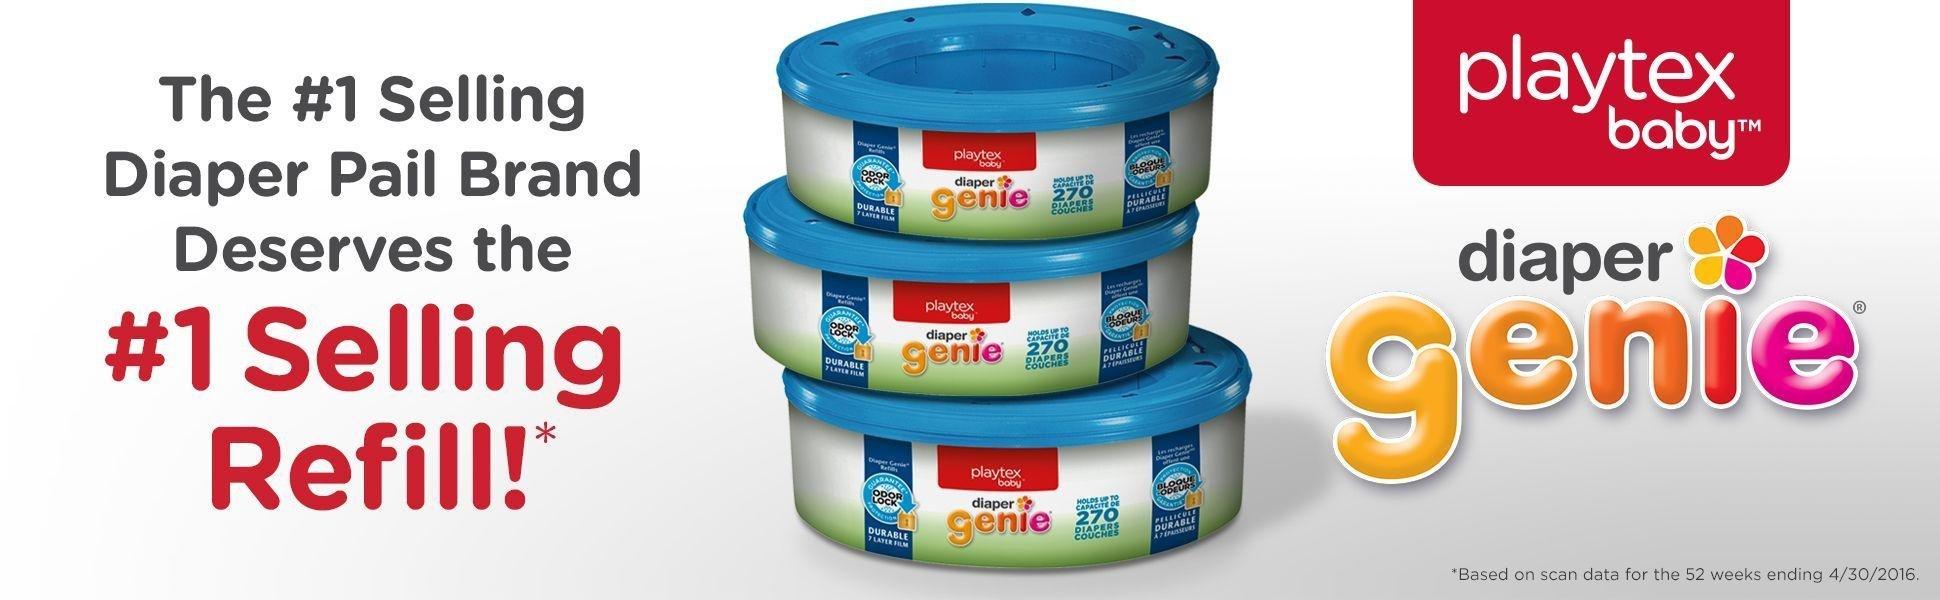 Amazon.com: Playtex Diaper Genie Refill Bags, Ideal for